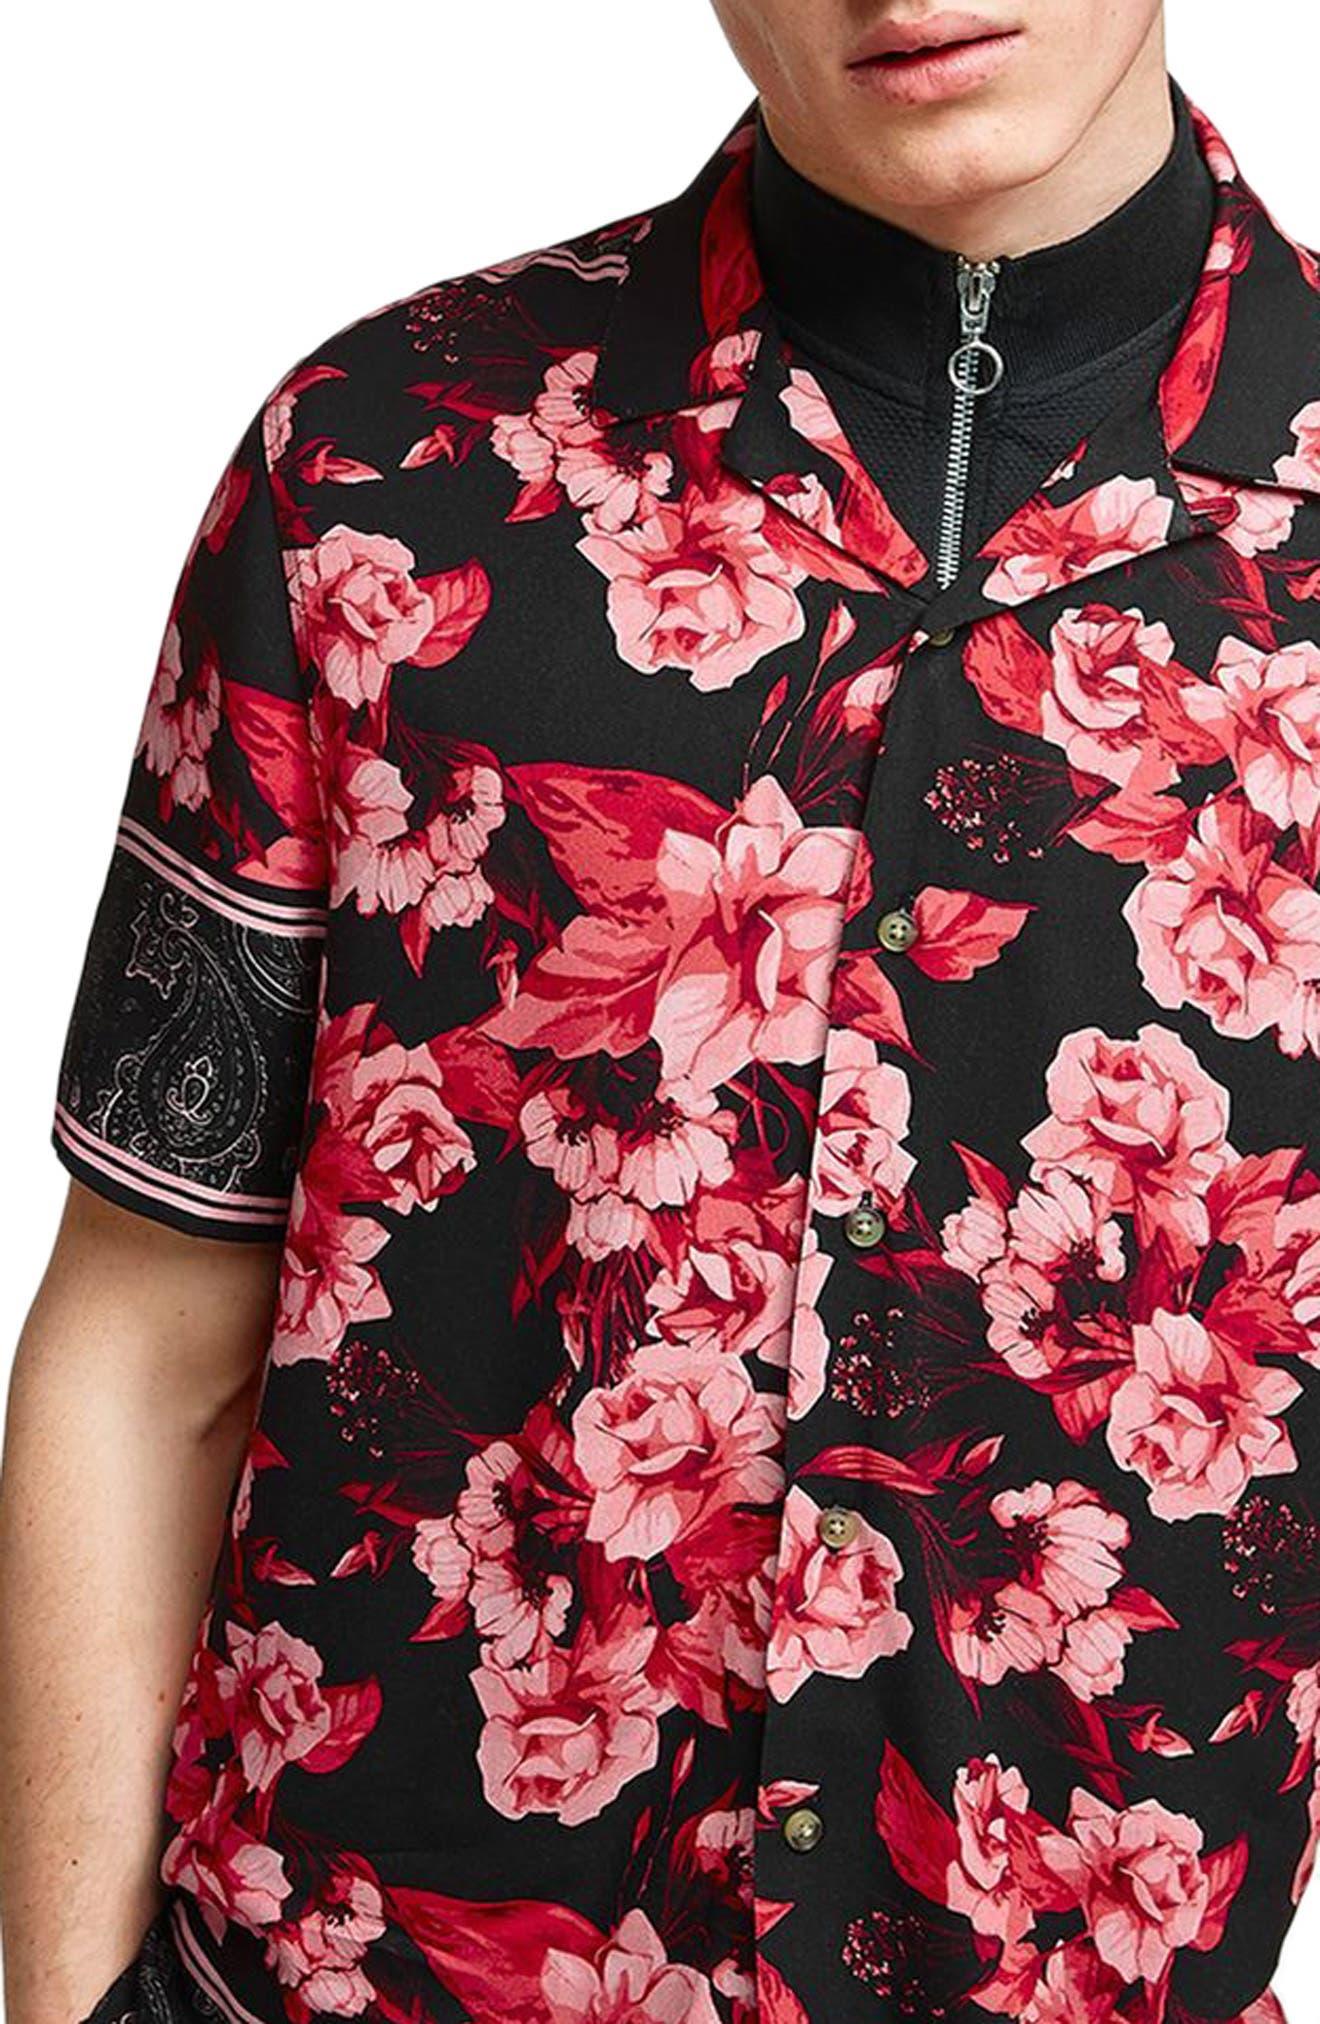 TOPMAN Floral Print Shirt, Main, color, 640